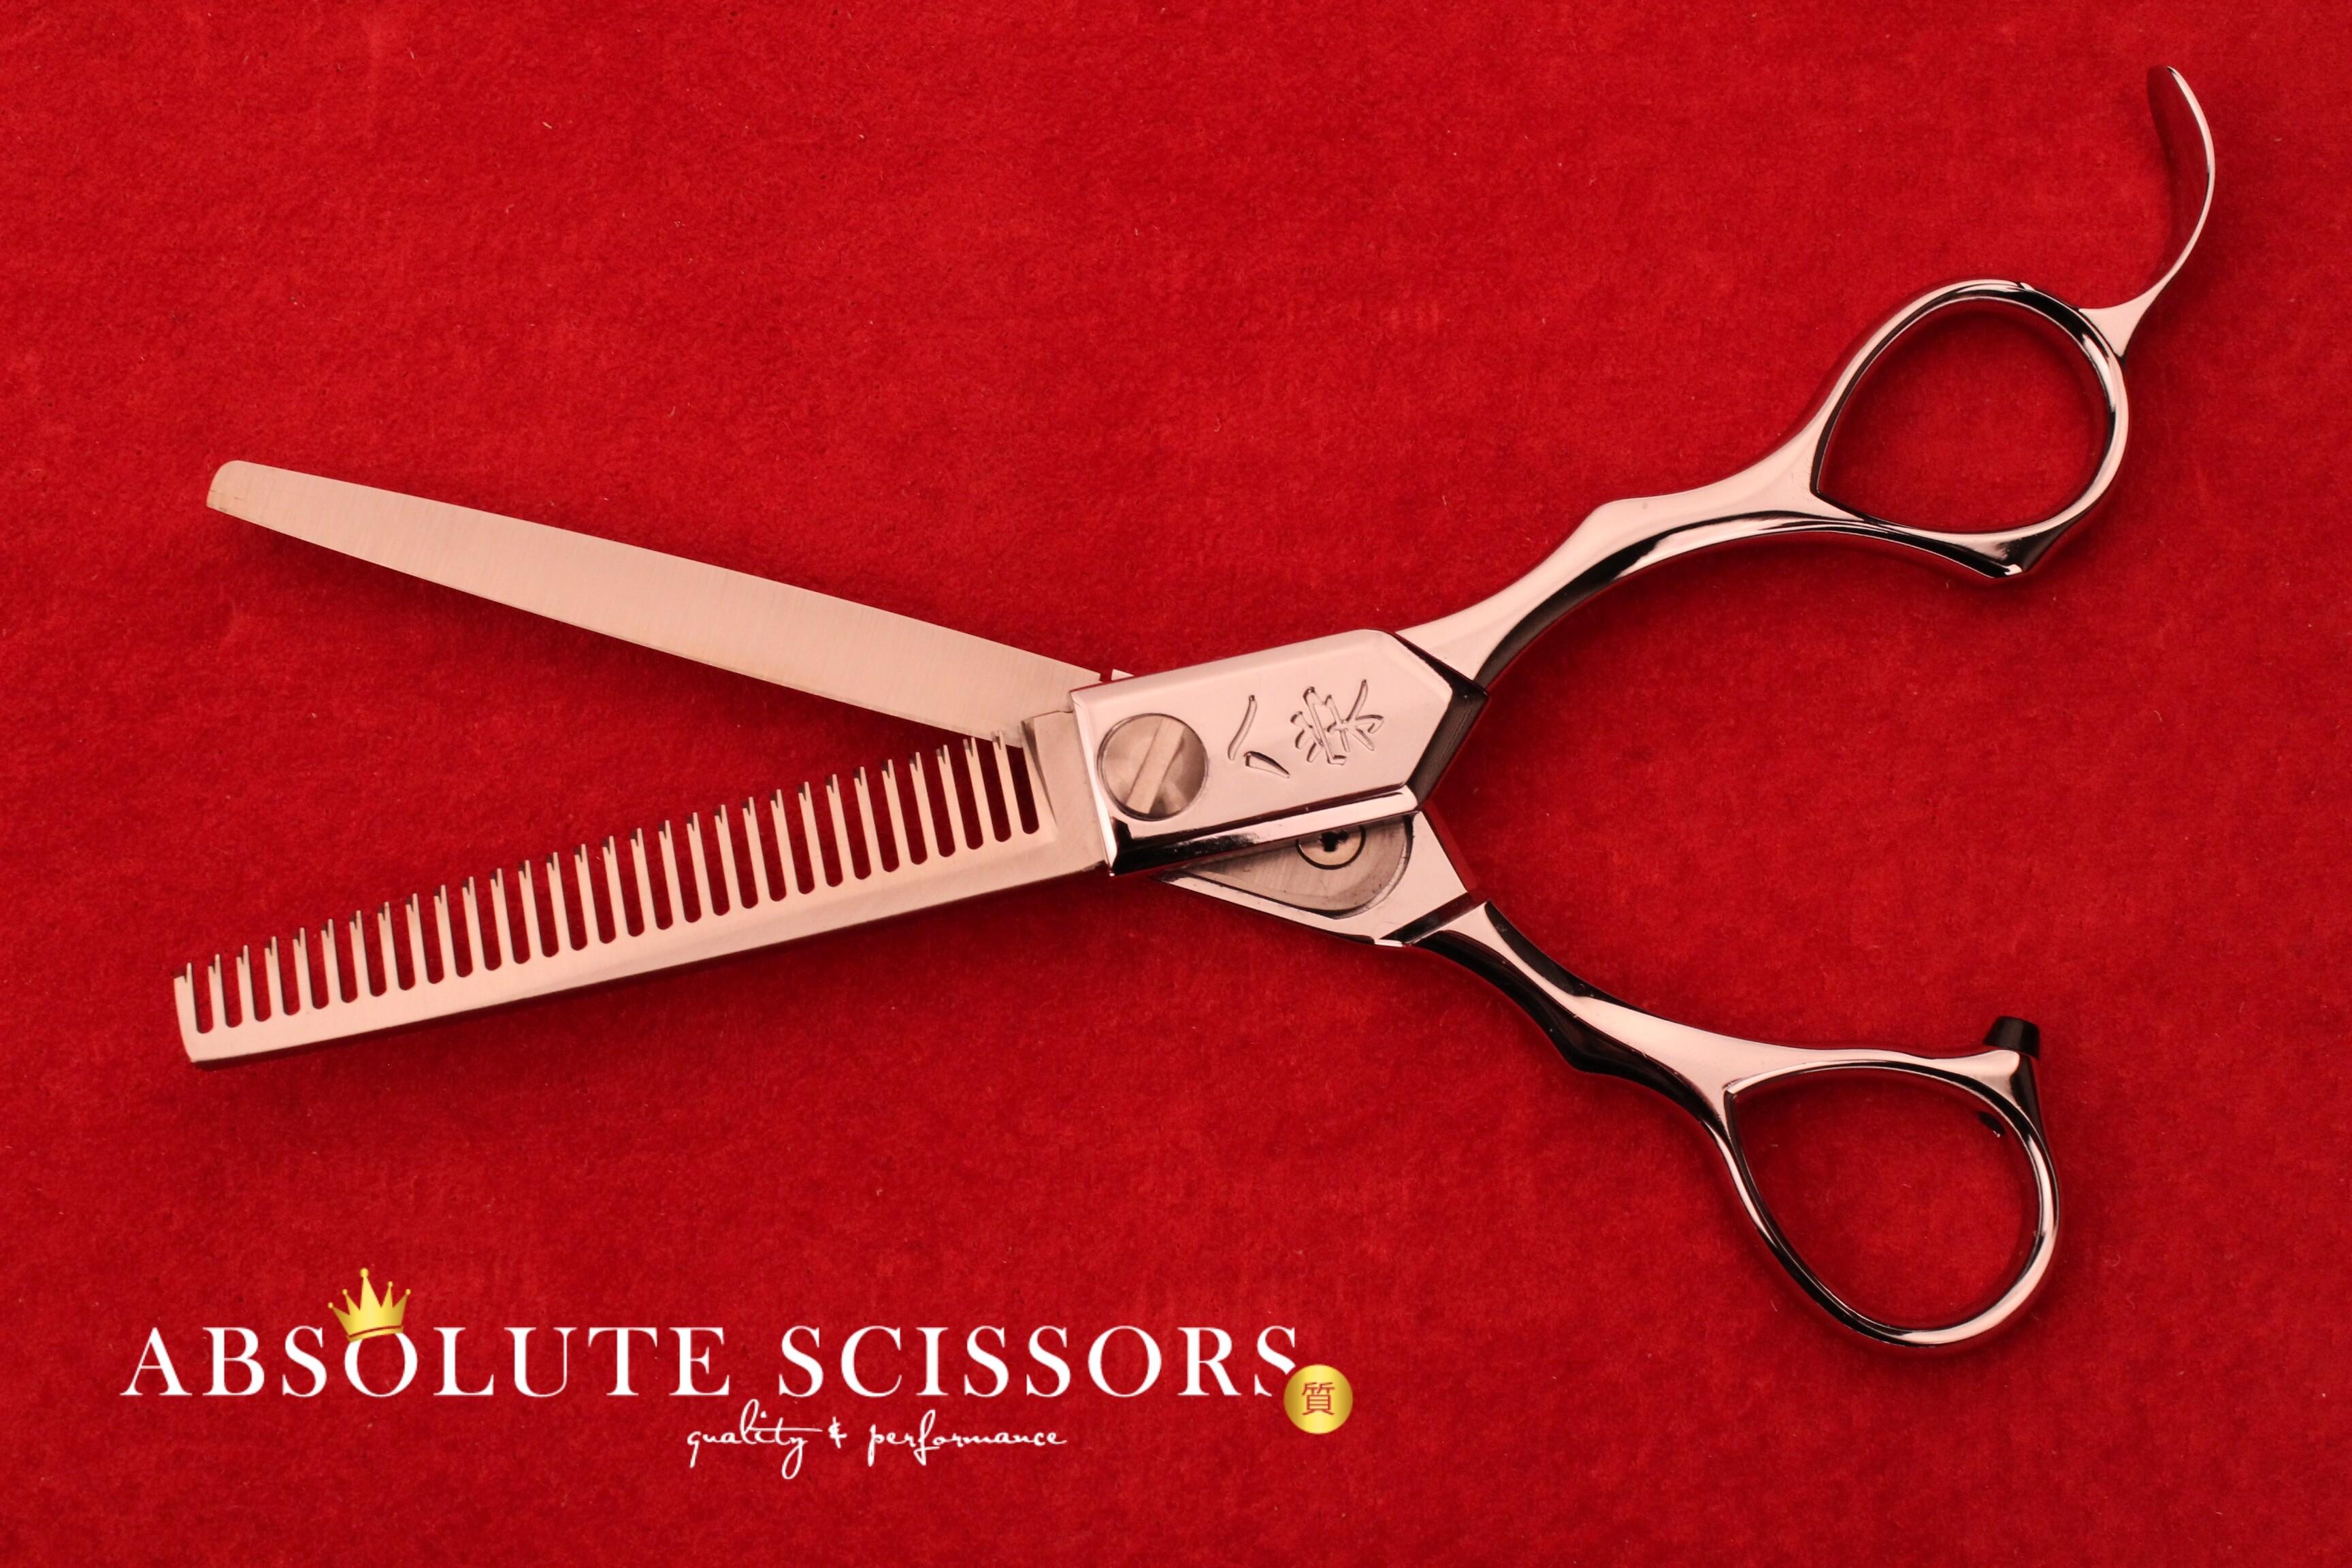 yasaka hair shears ys size 300